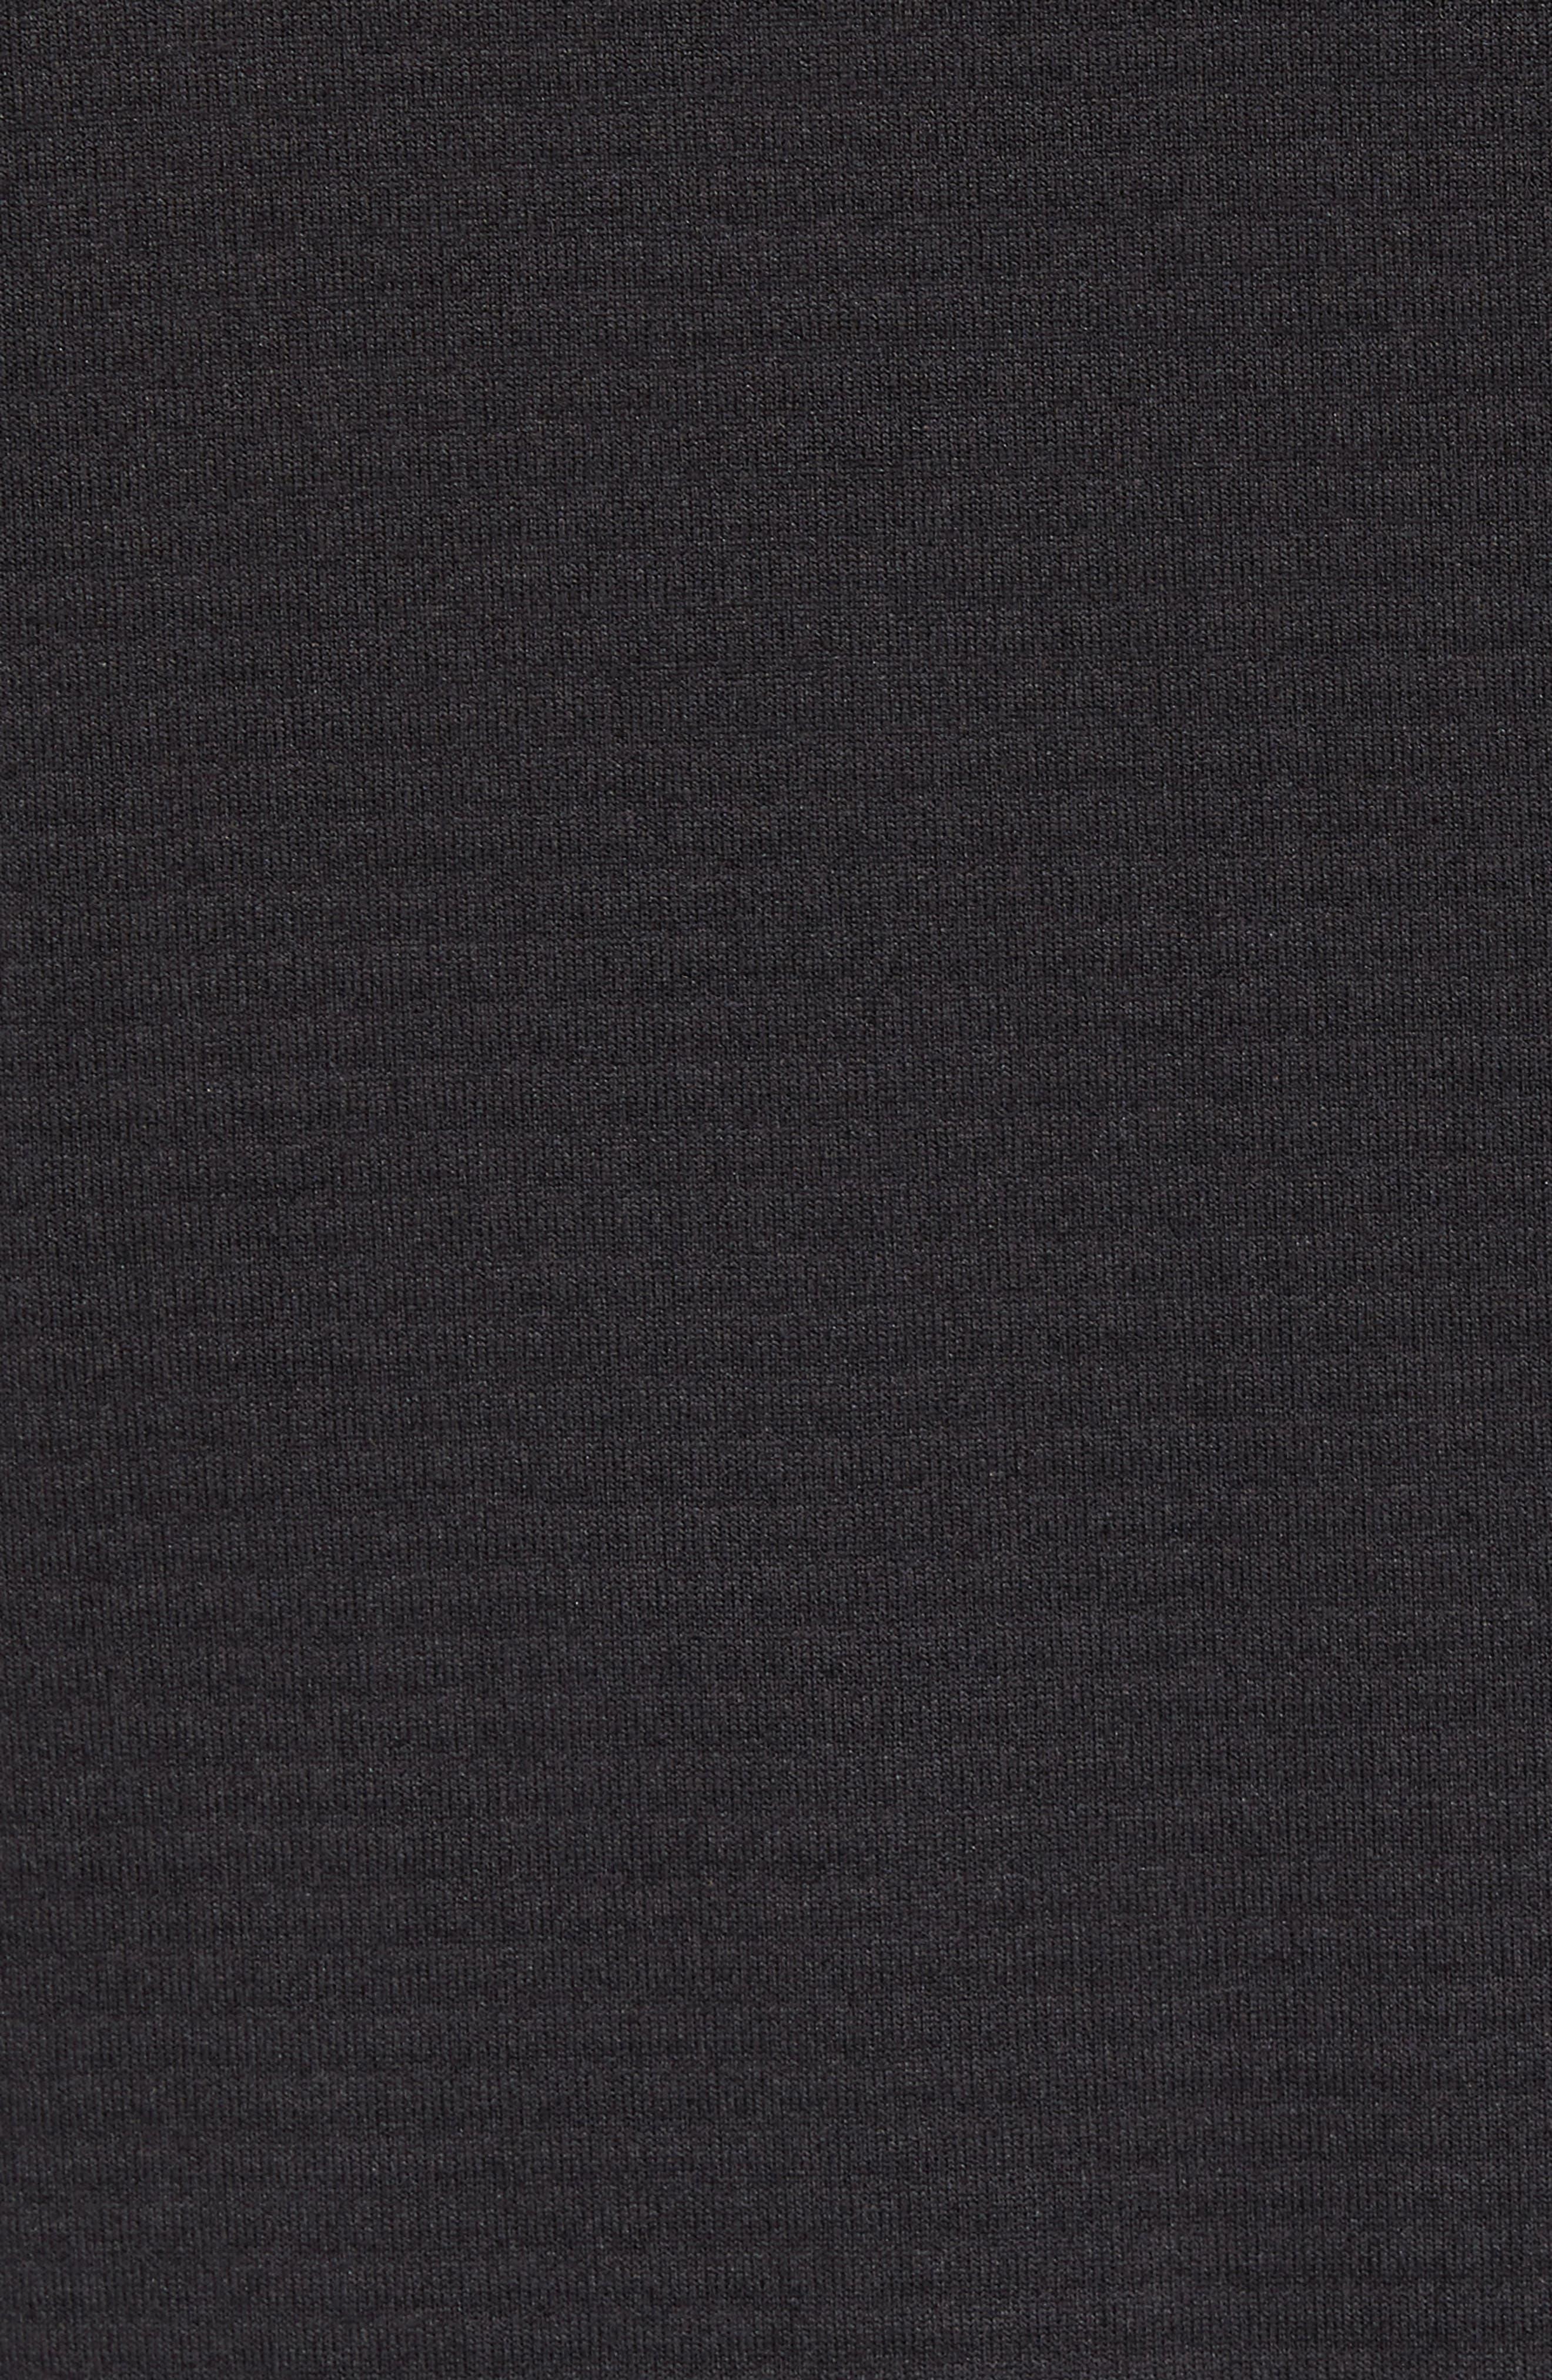 Progressor Power Grid<sup>™</sup> Hooded Fleece Jacket,                             Alternate thumbnail 5, color,                             Black/ Black